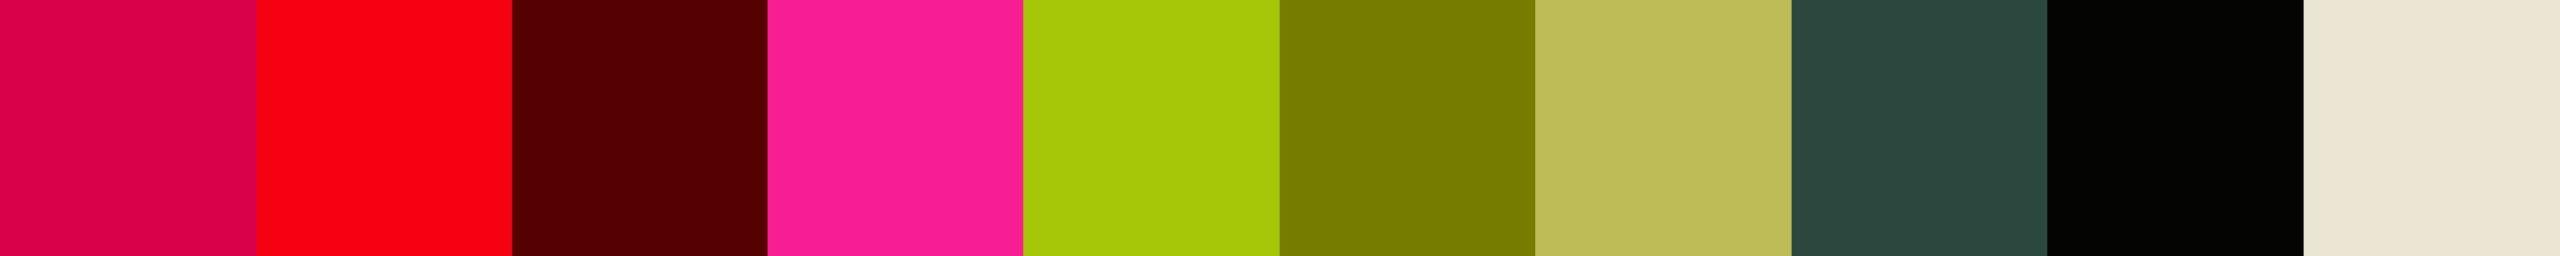 31 Savala Color Palette